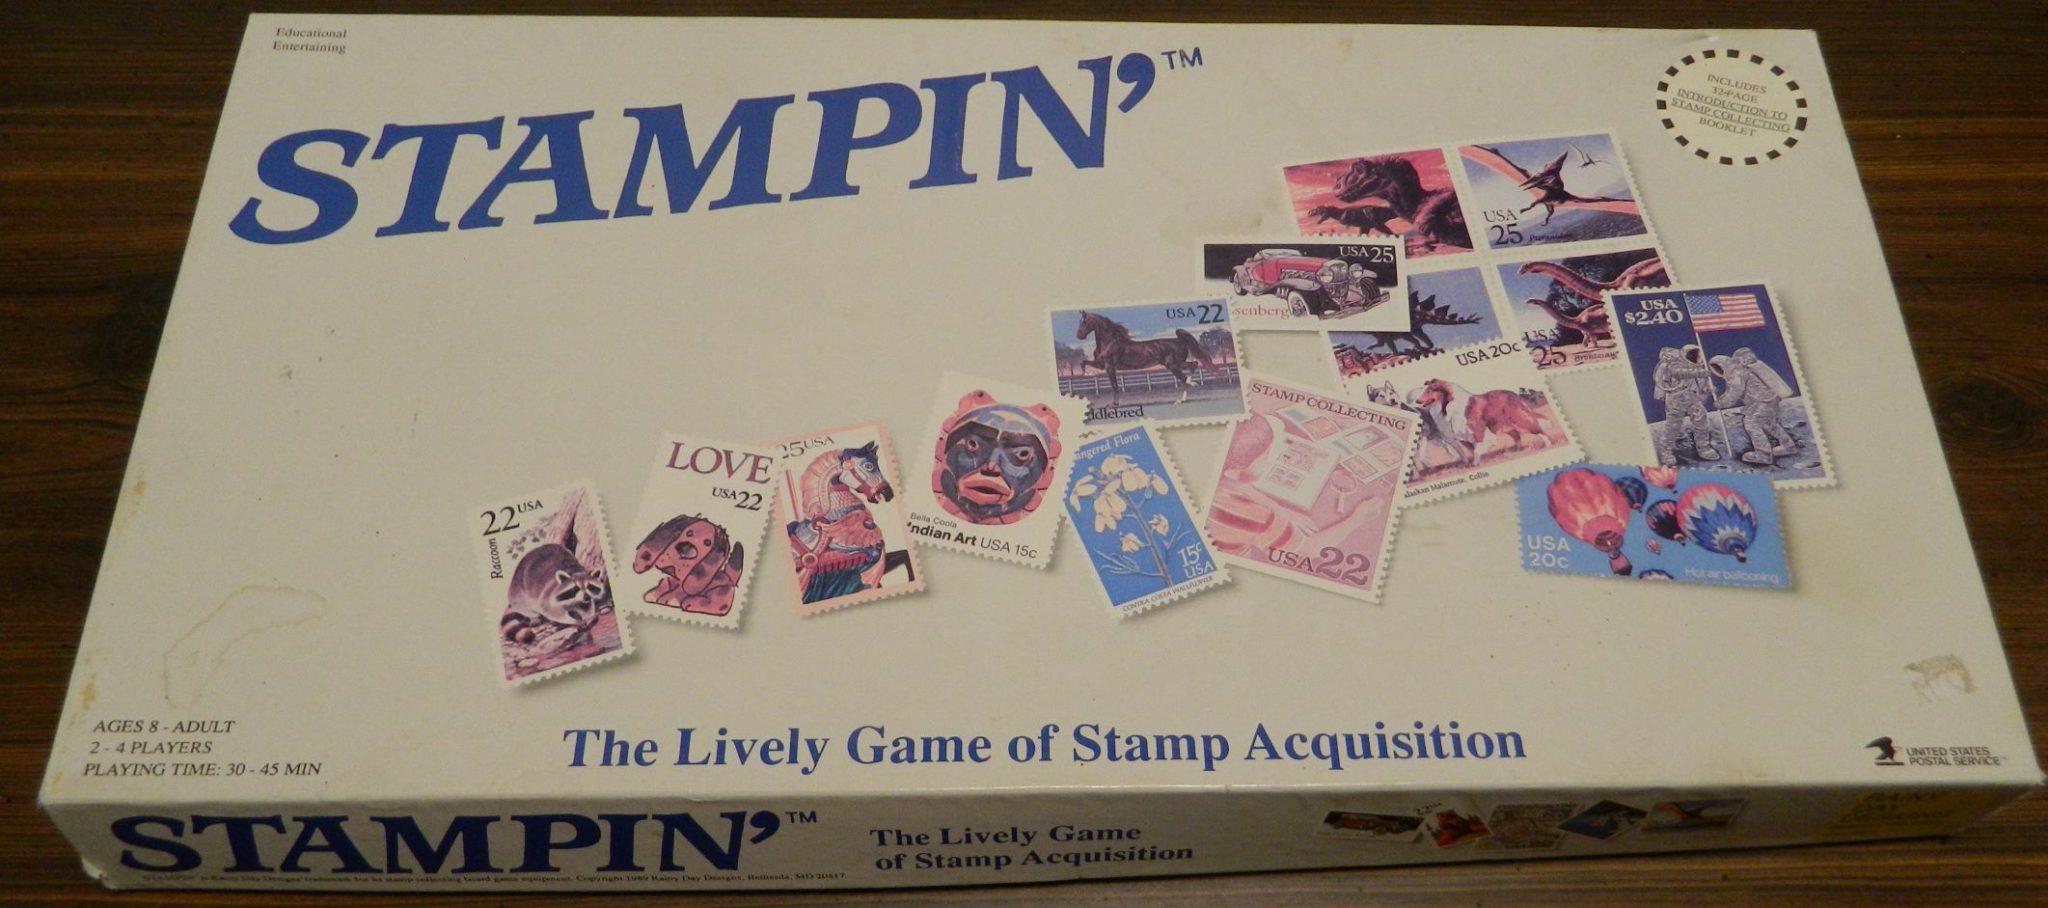 Stampin' Box